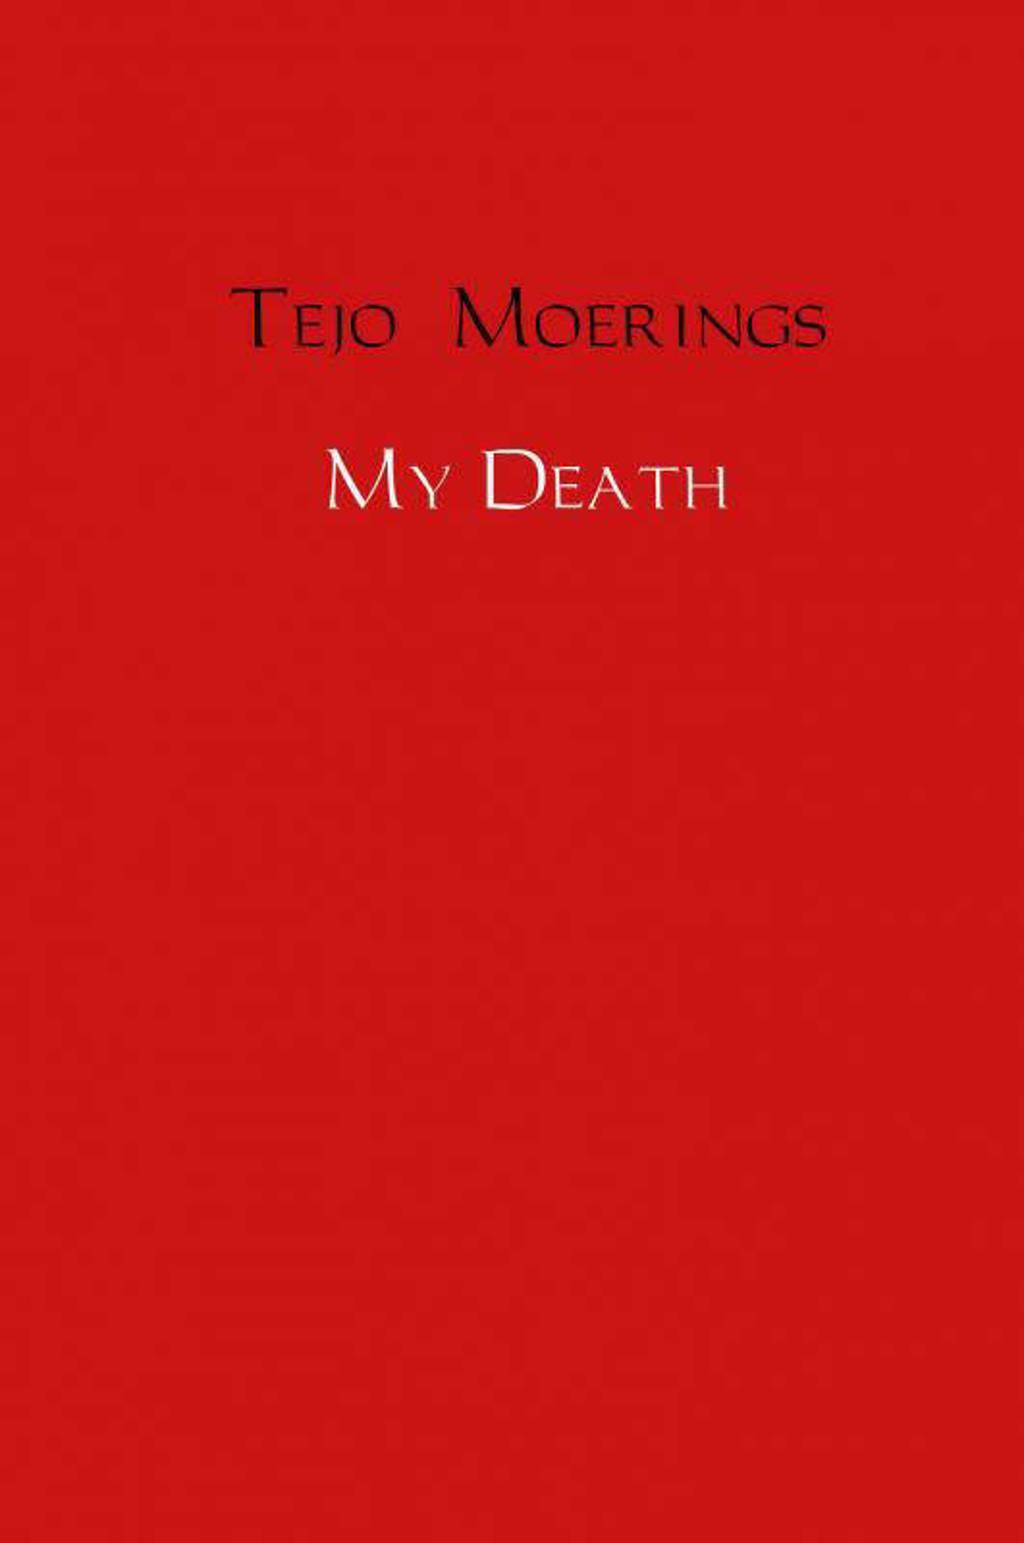 My Death - Tejo Moerings